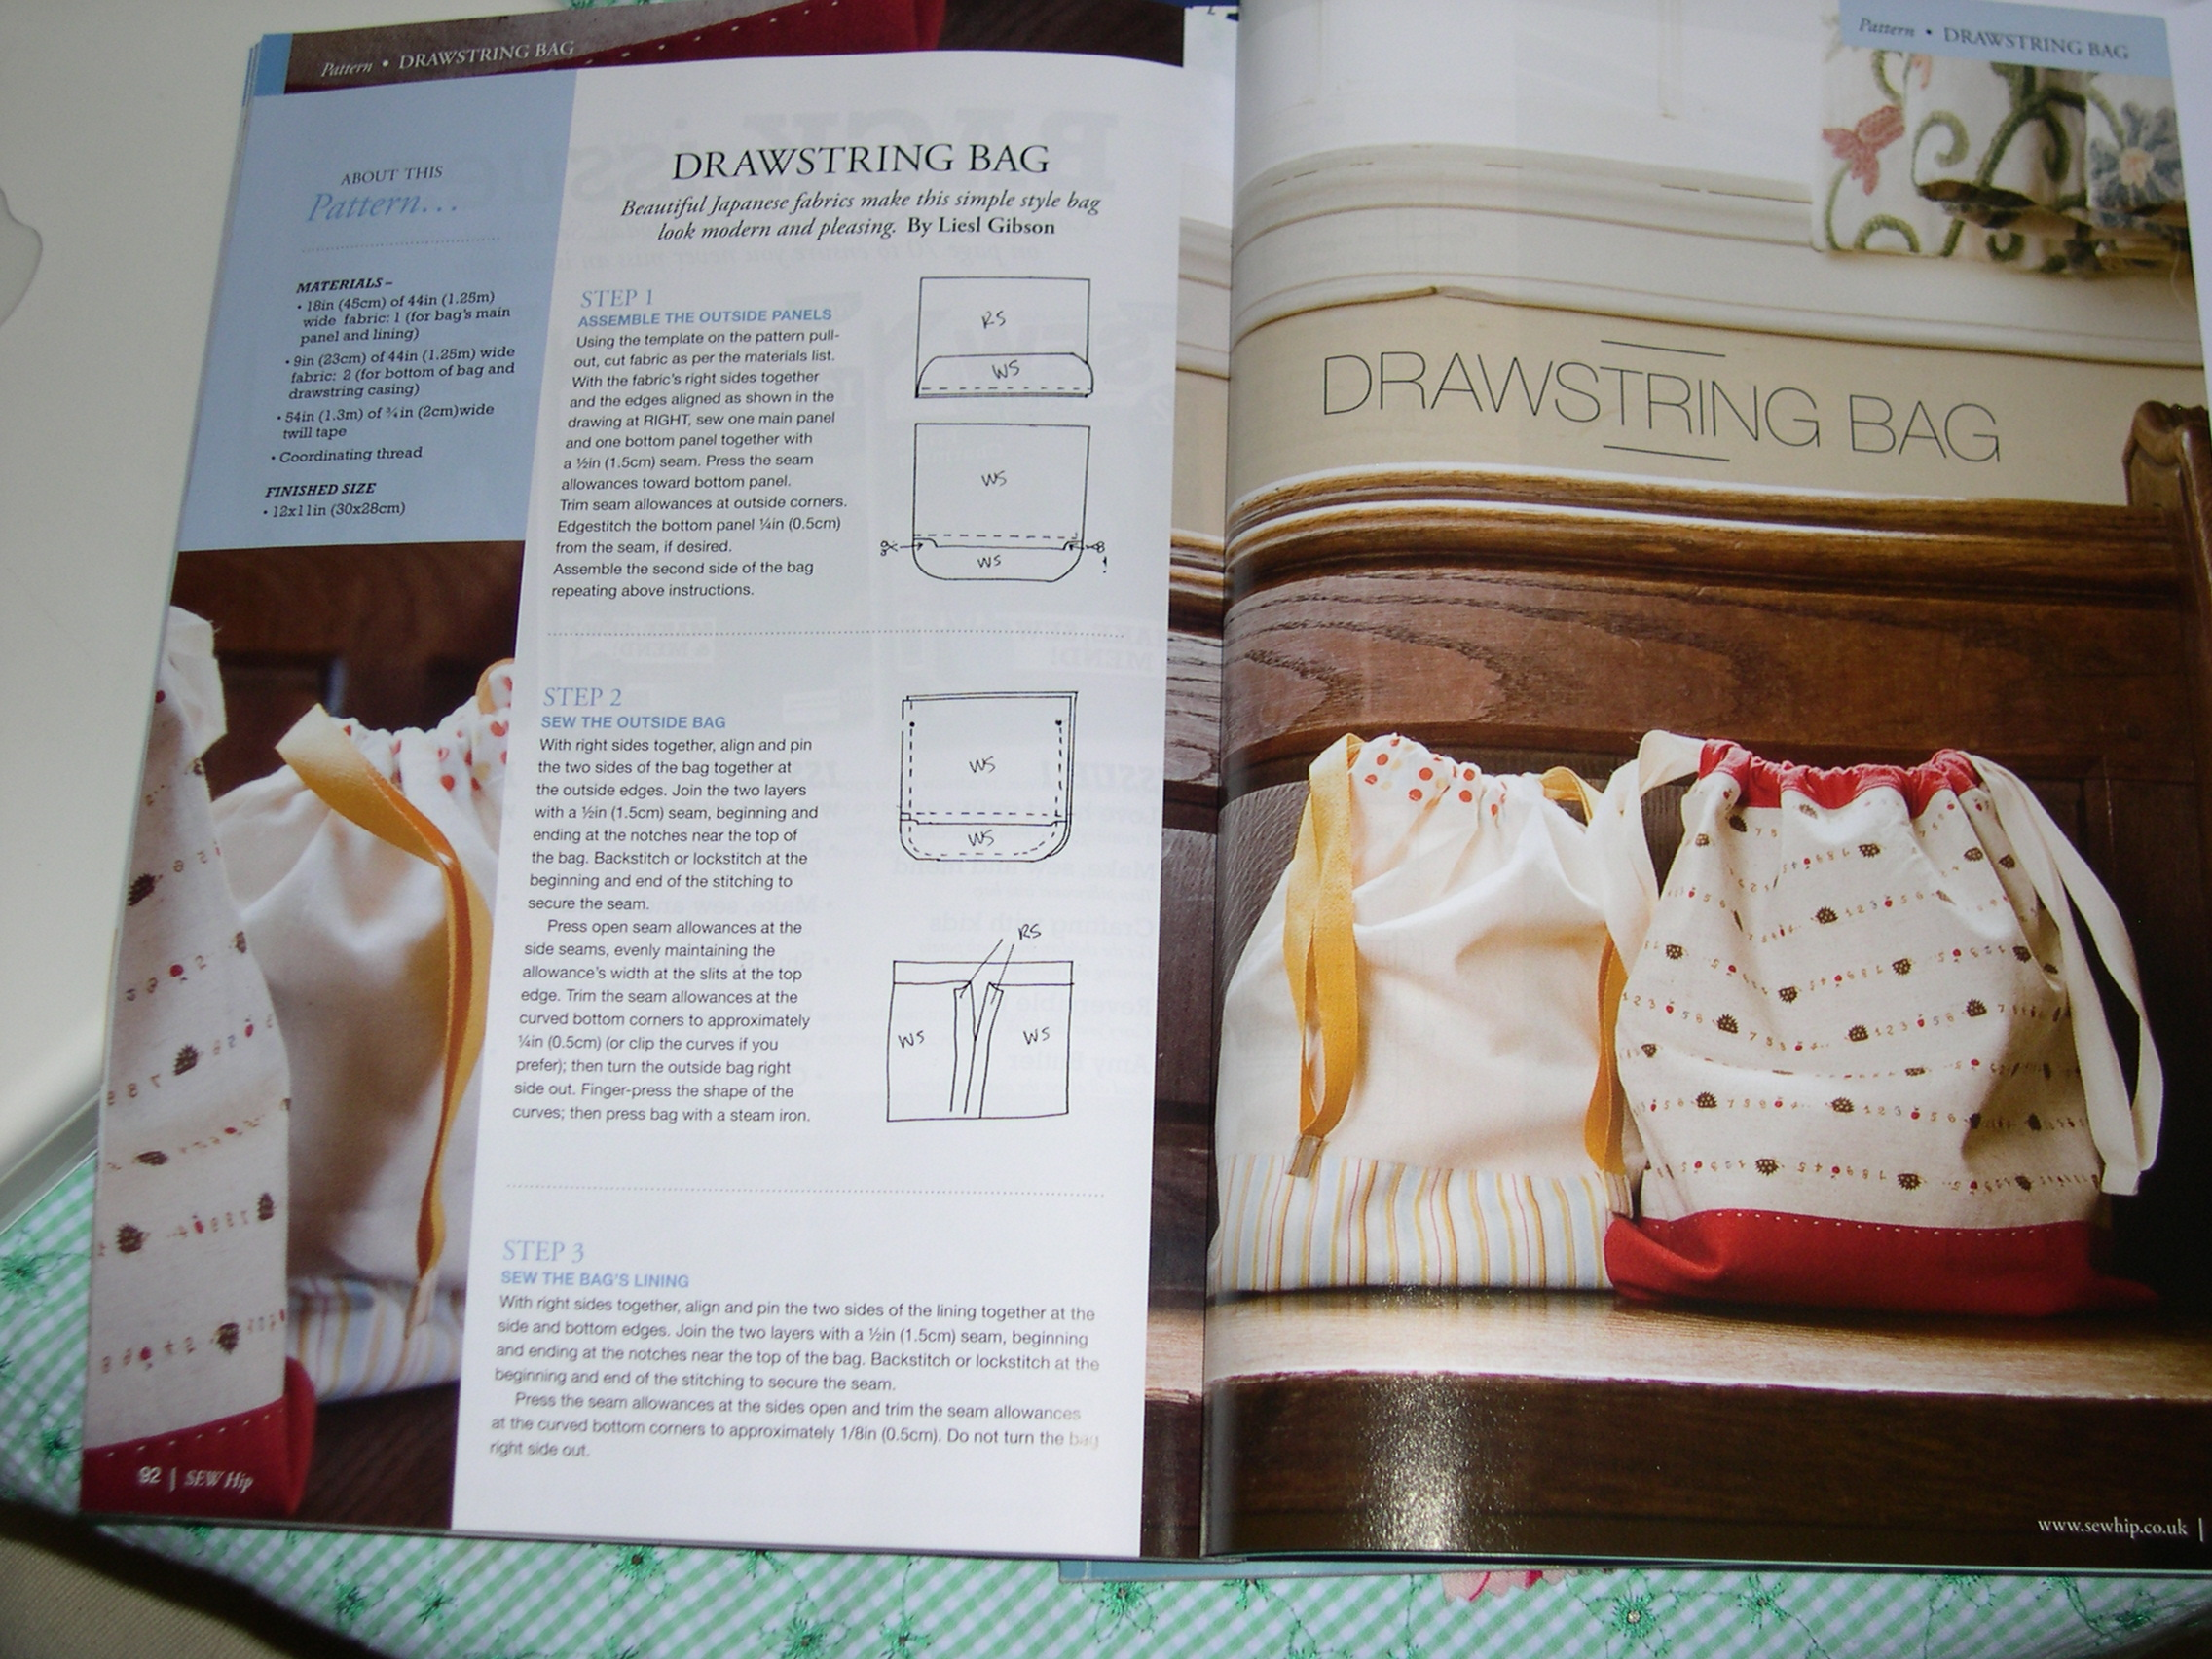 Sew Hip-Mar09-drawstring bag project